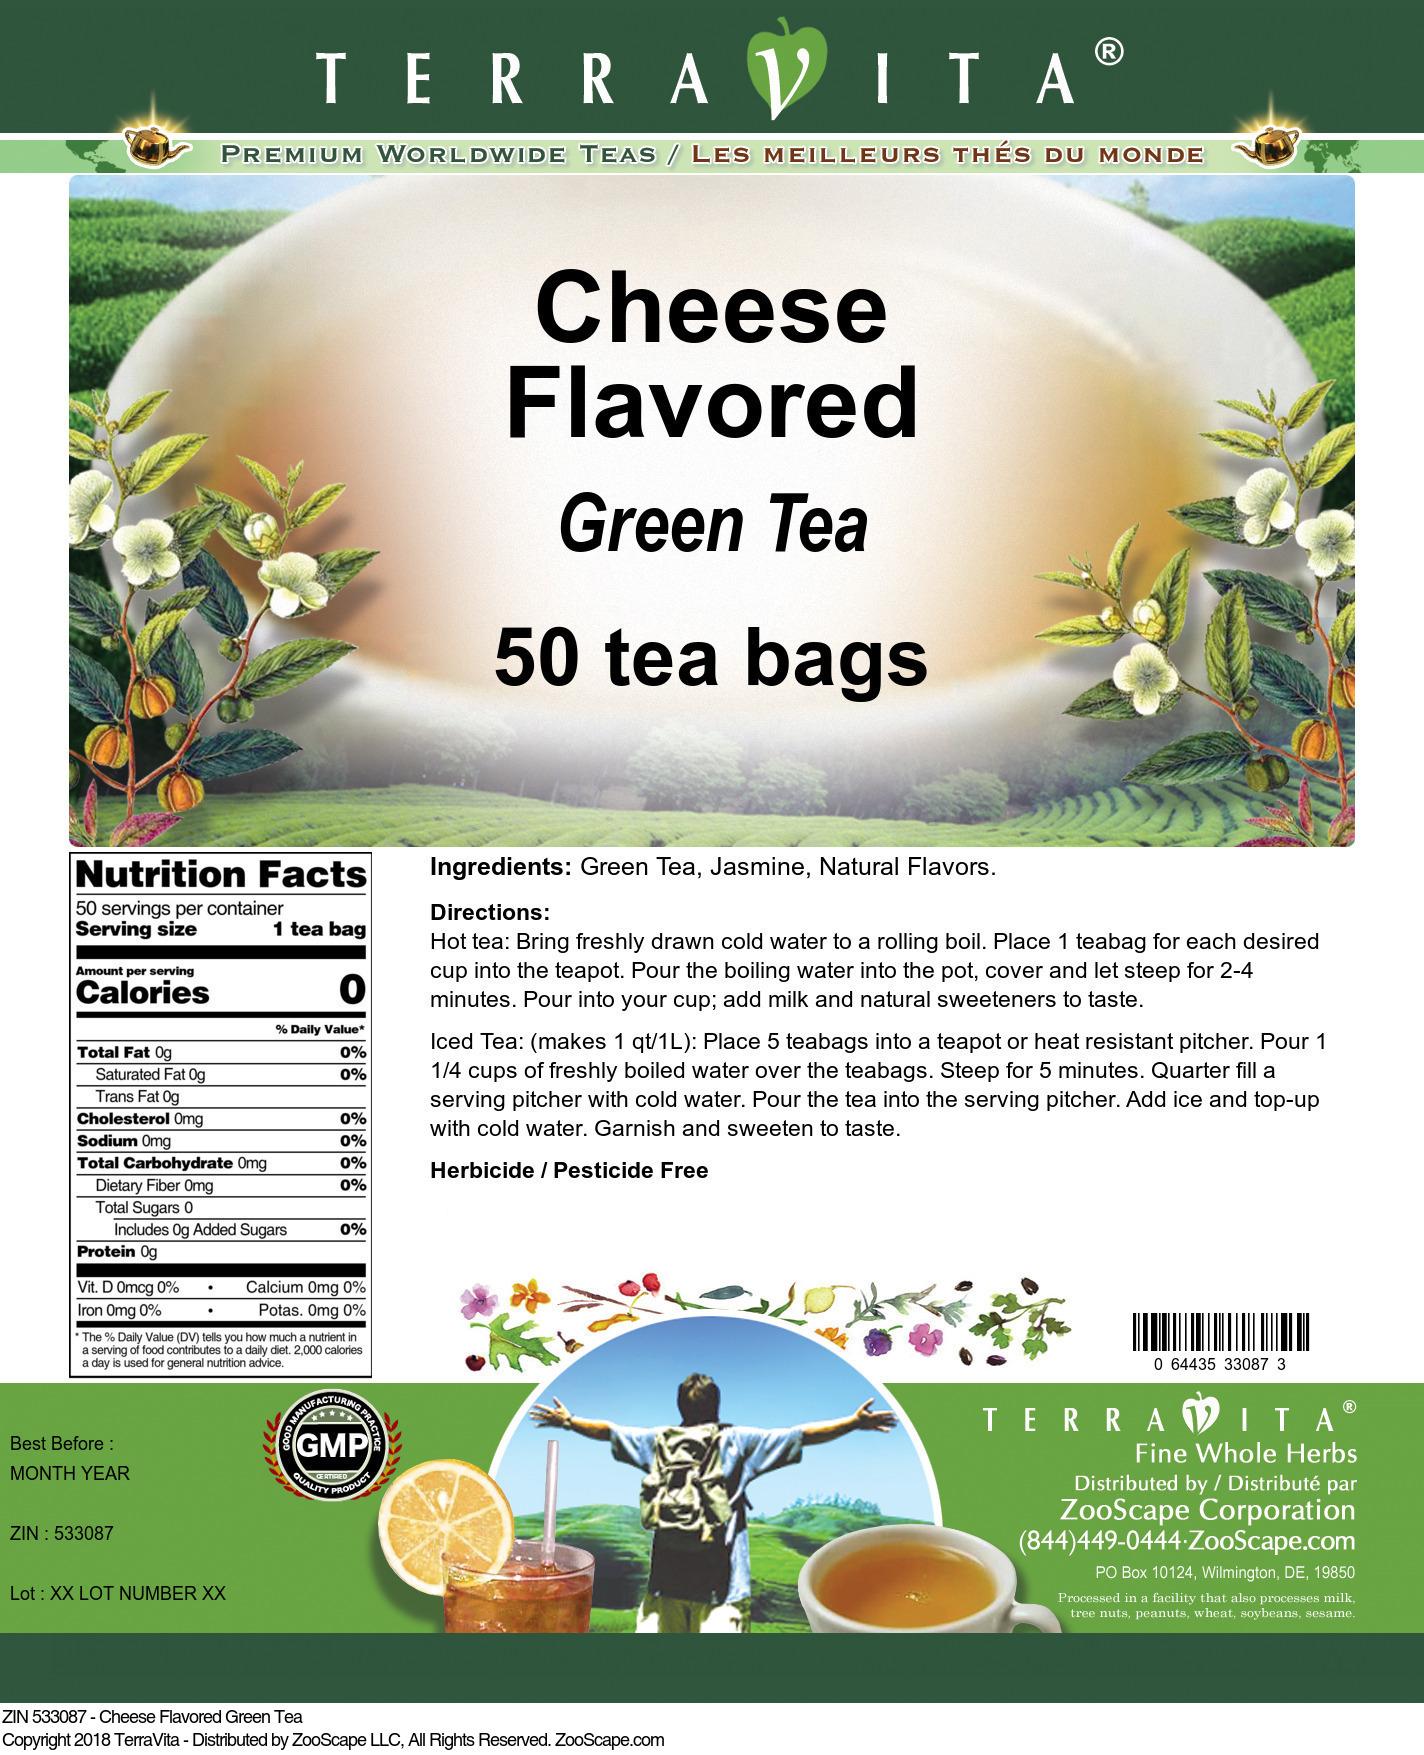 Cheese Flavored Green Tea